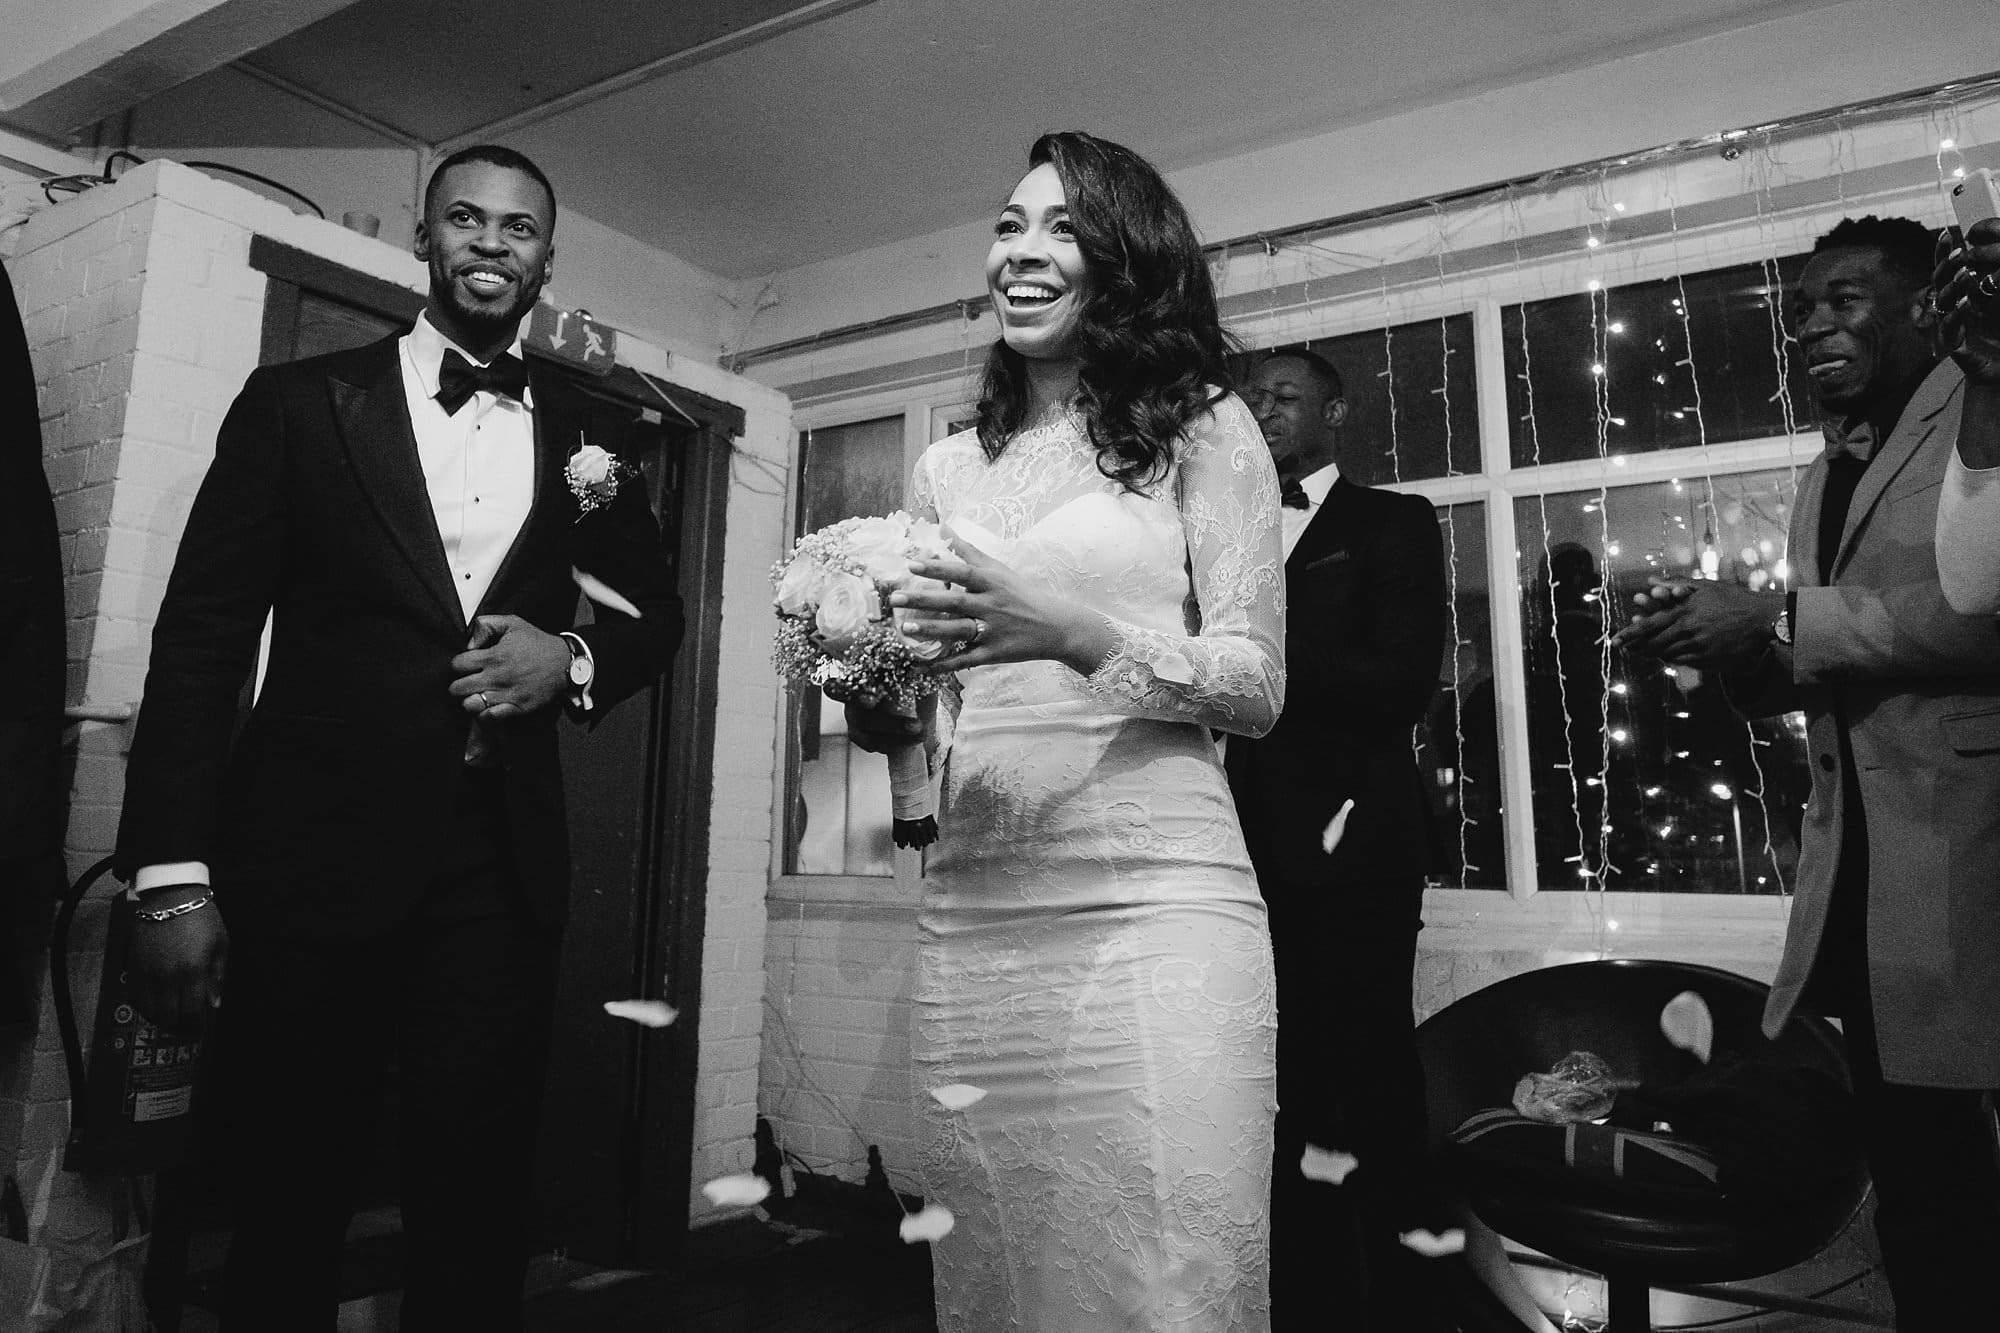 asia house london wedding photographer 035 - Rachel + Gabriel   Asia House Wedding Photography